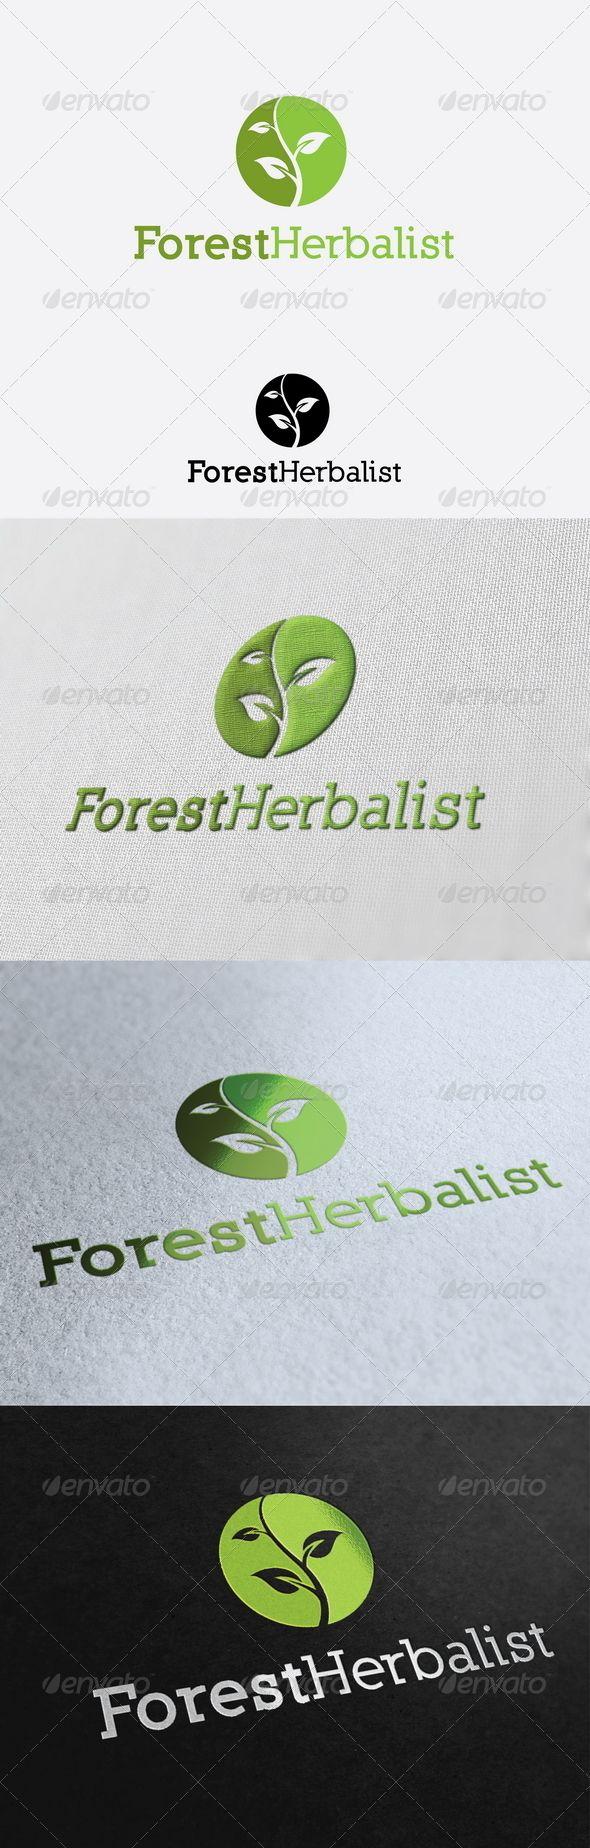 Forest Herbalist Logo Template 945 best LOGO